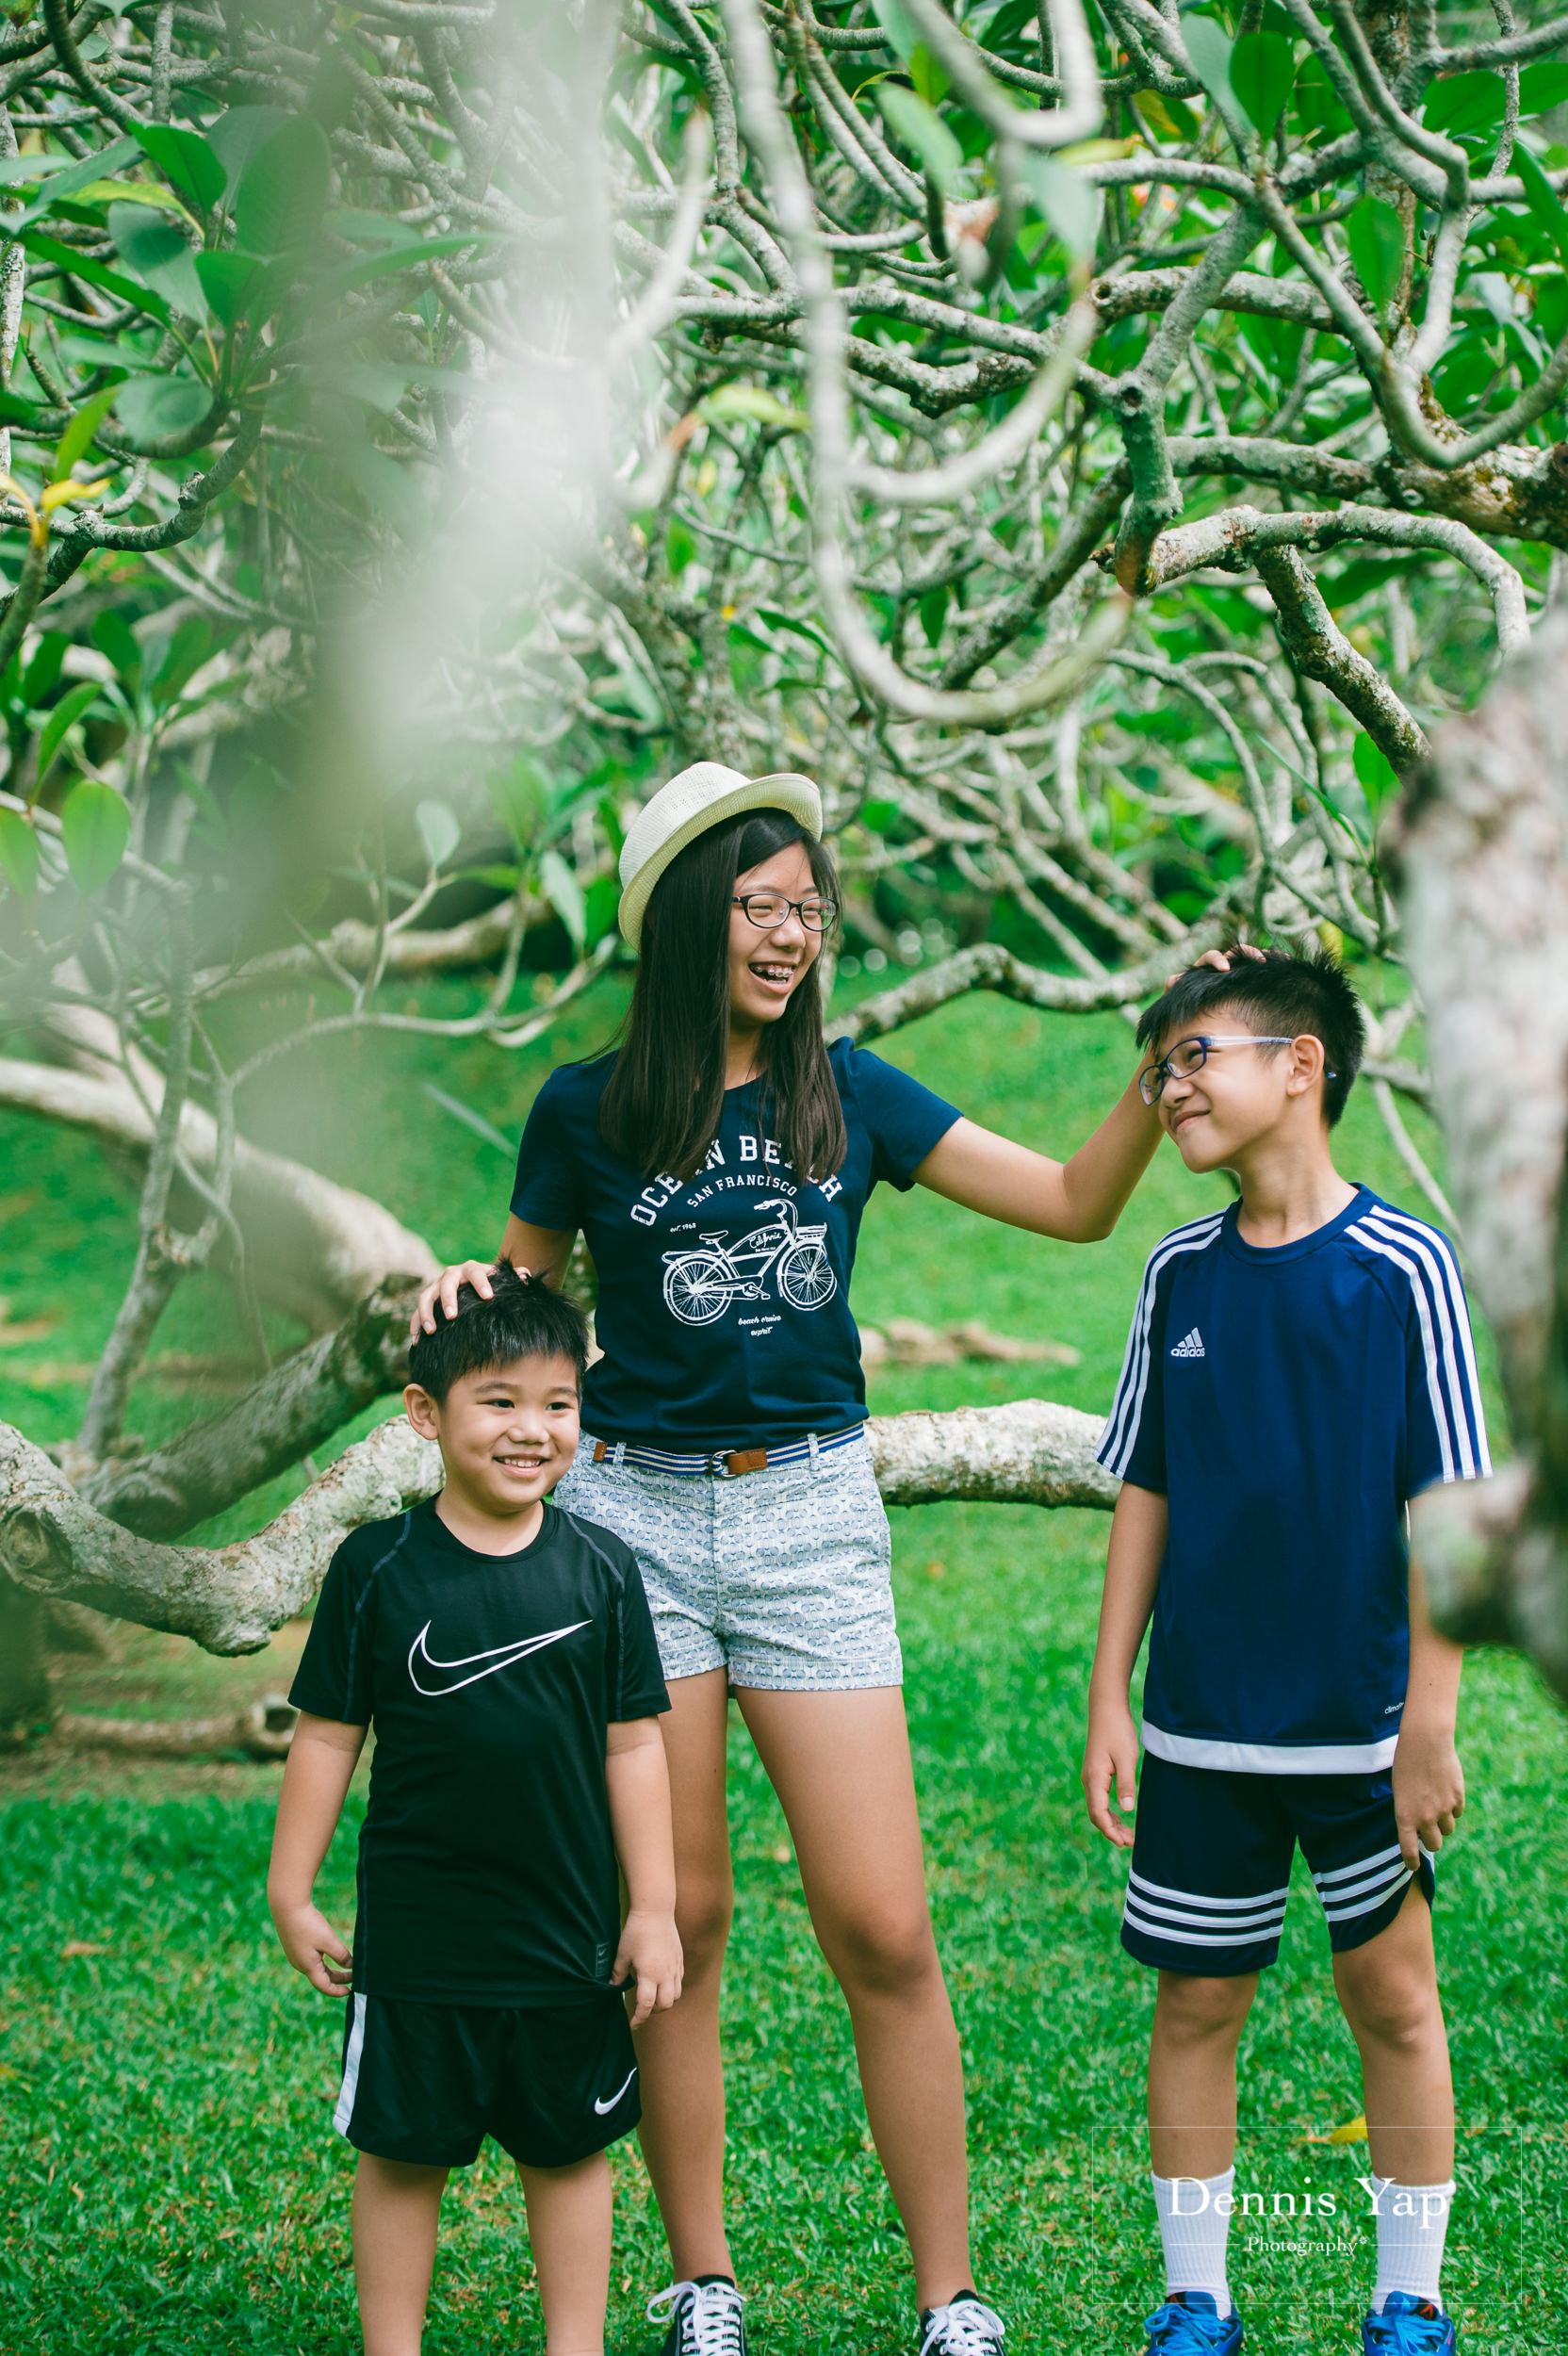 mai yin family portrait singapore botanical garden dennis yap photography malaysia-4.jpg